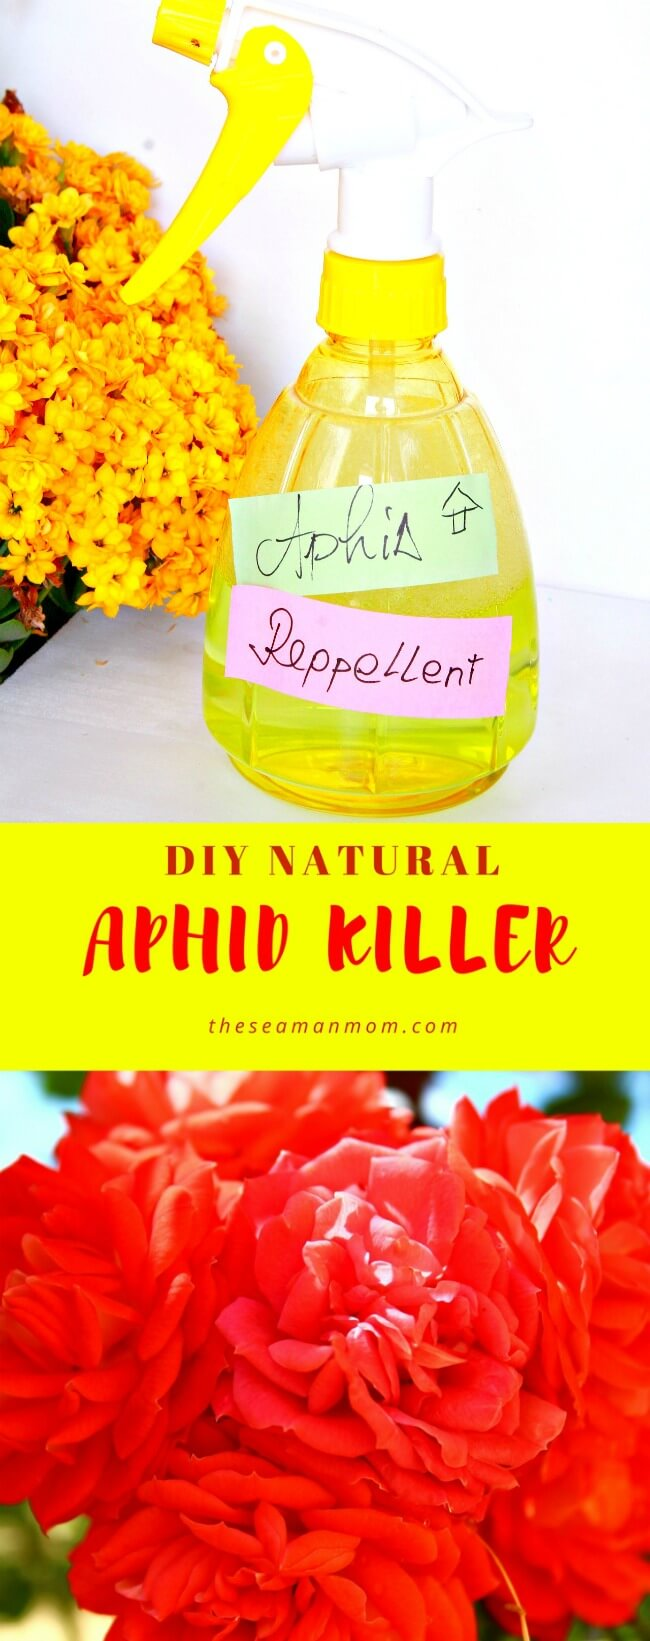 DIY Aphid Repellent